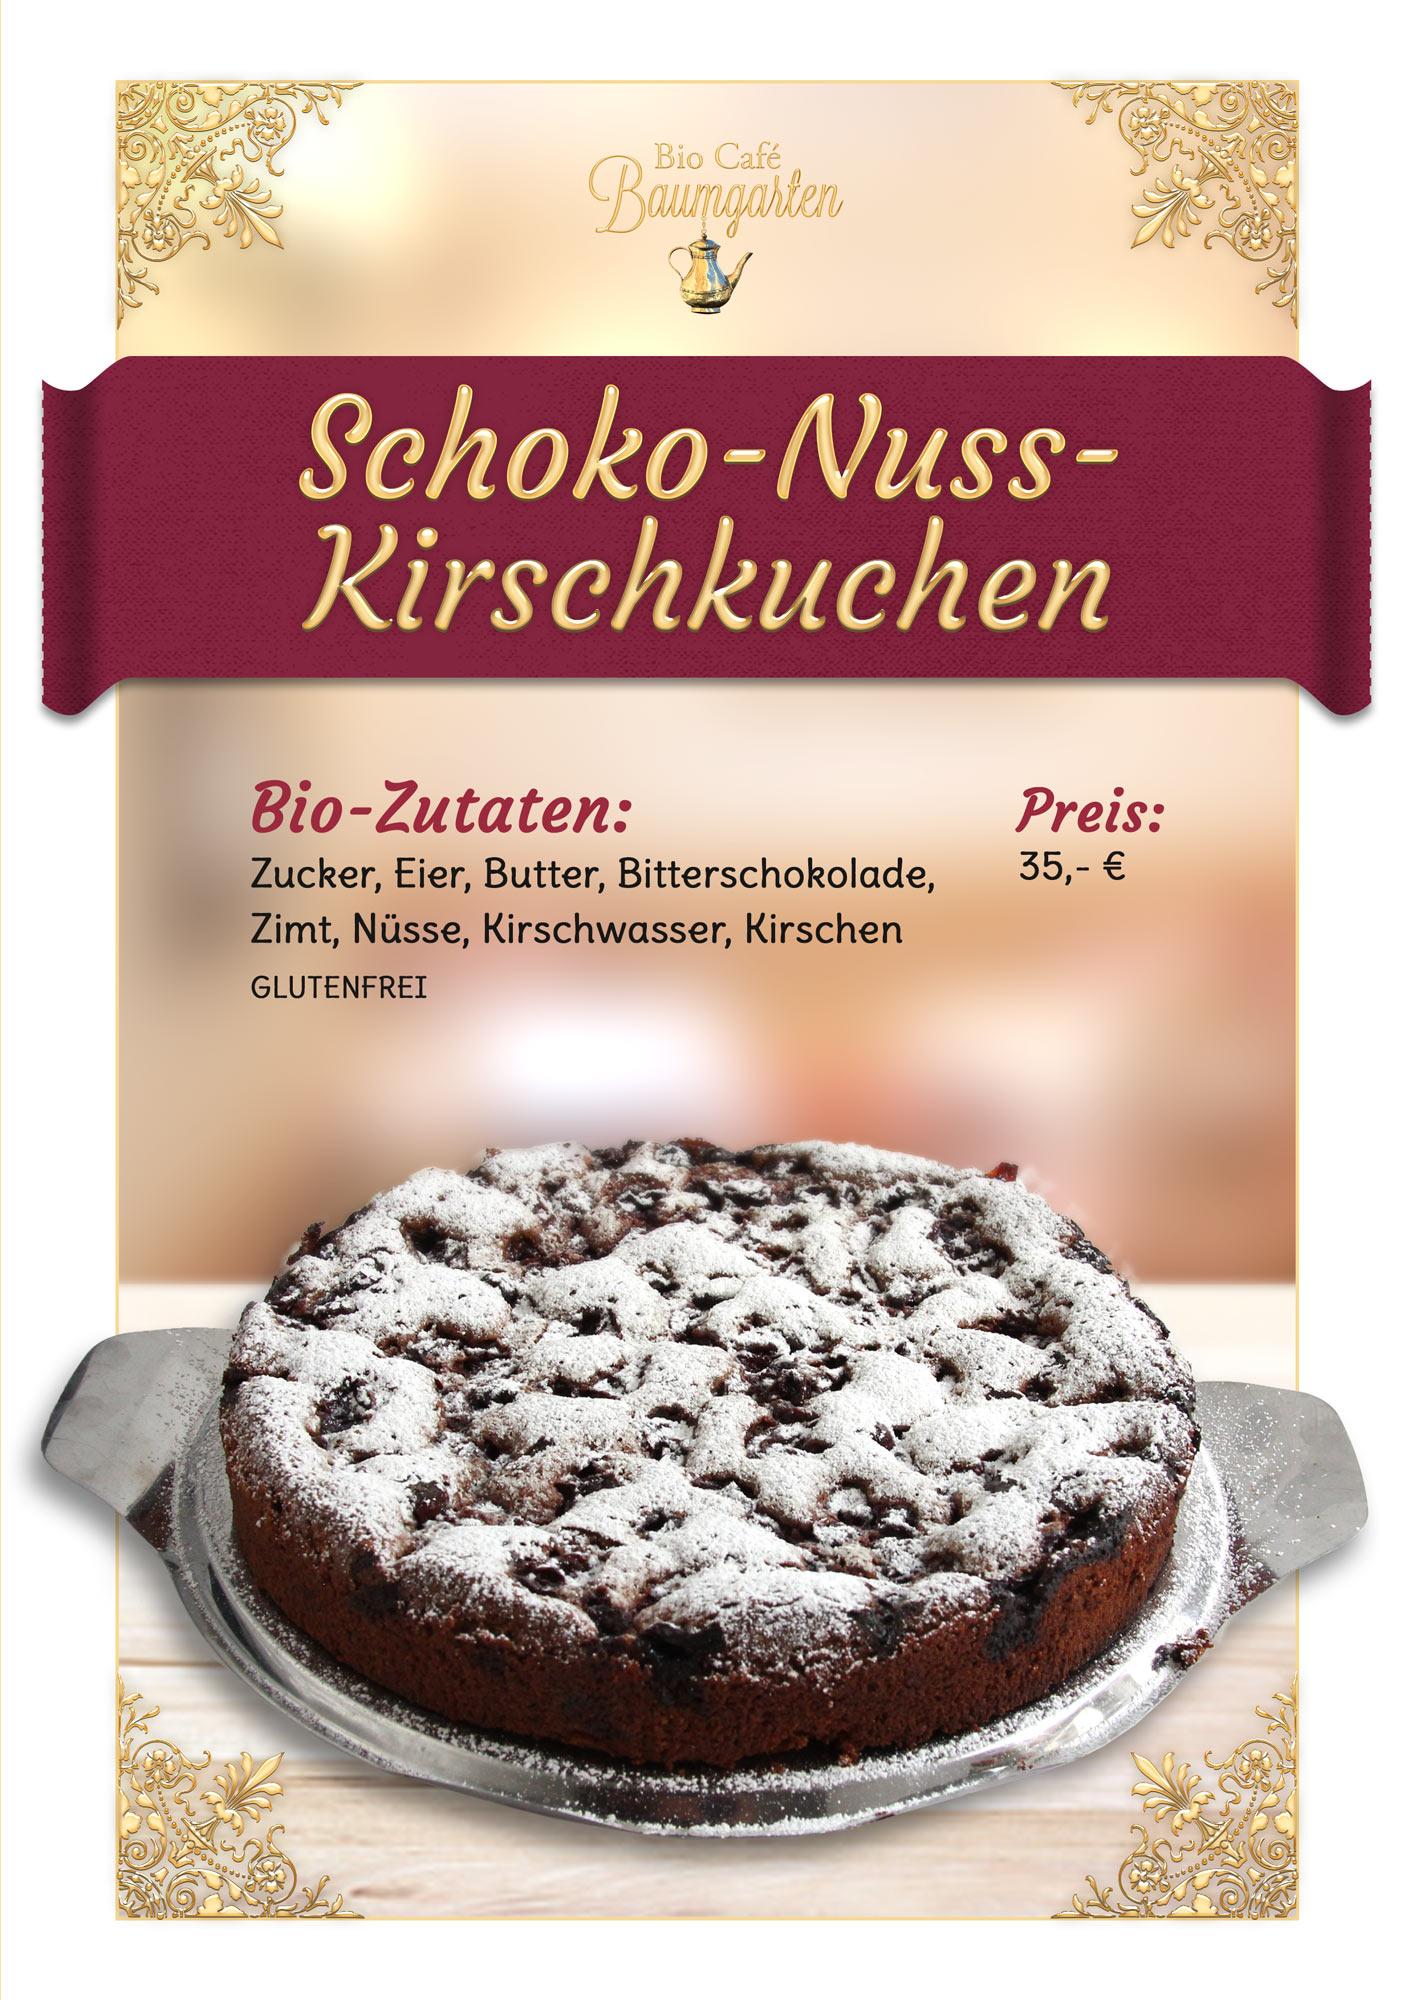 Schoko-Nuss-Kirschkuchen